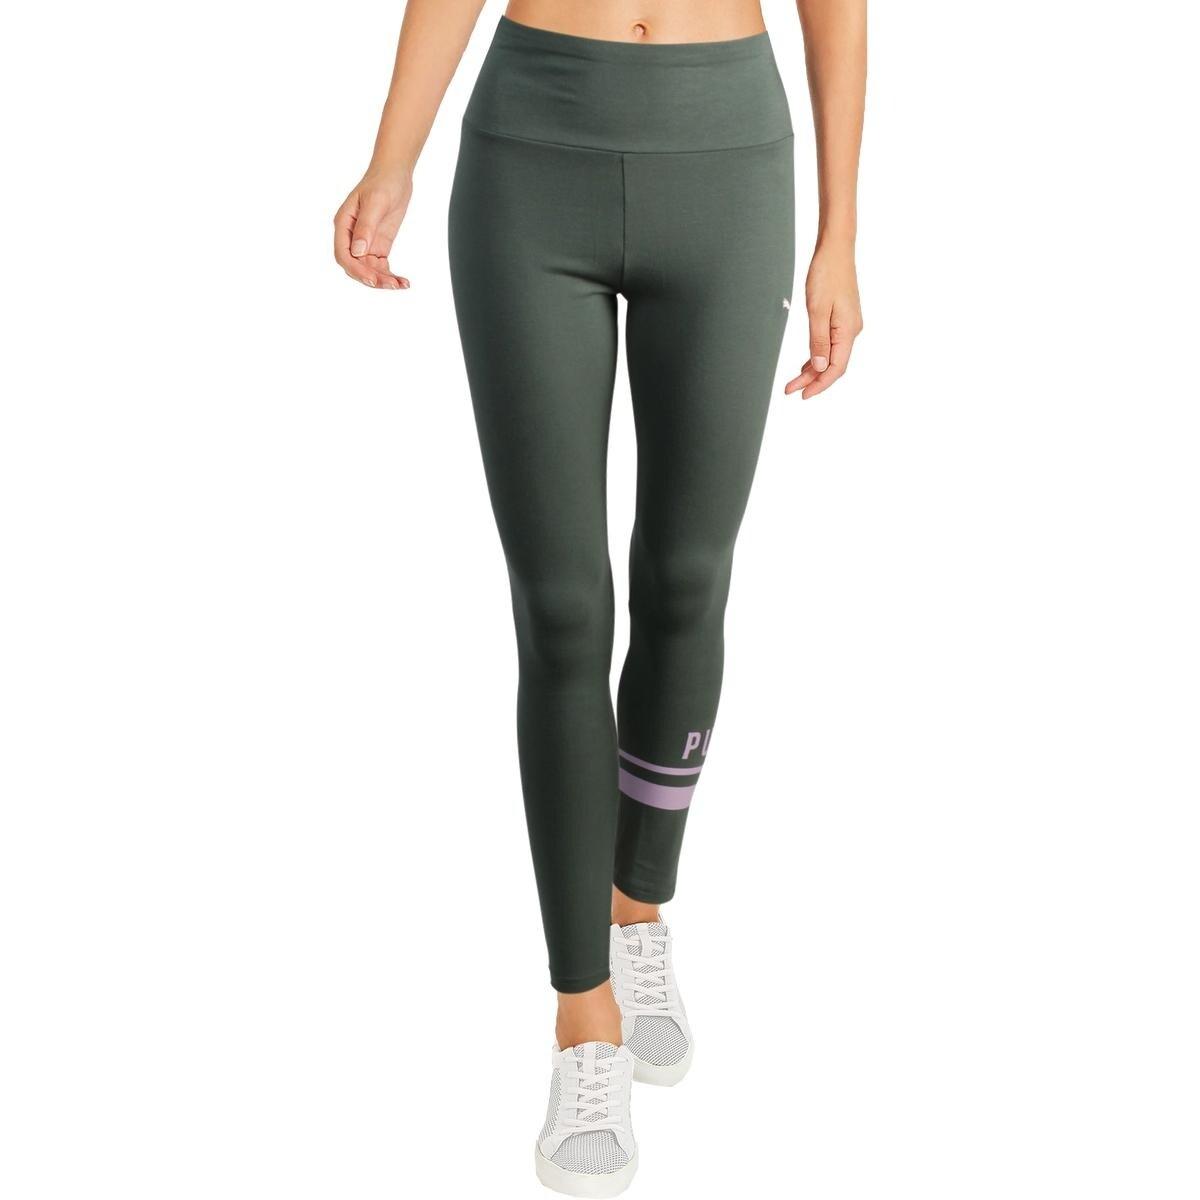 71494c3b1b8 Puma Womens Athletic Leggings Tight Fit Fitness